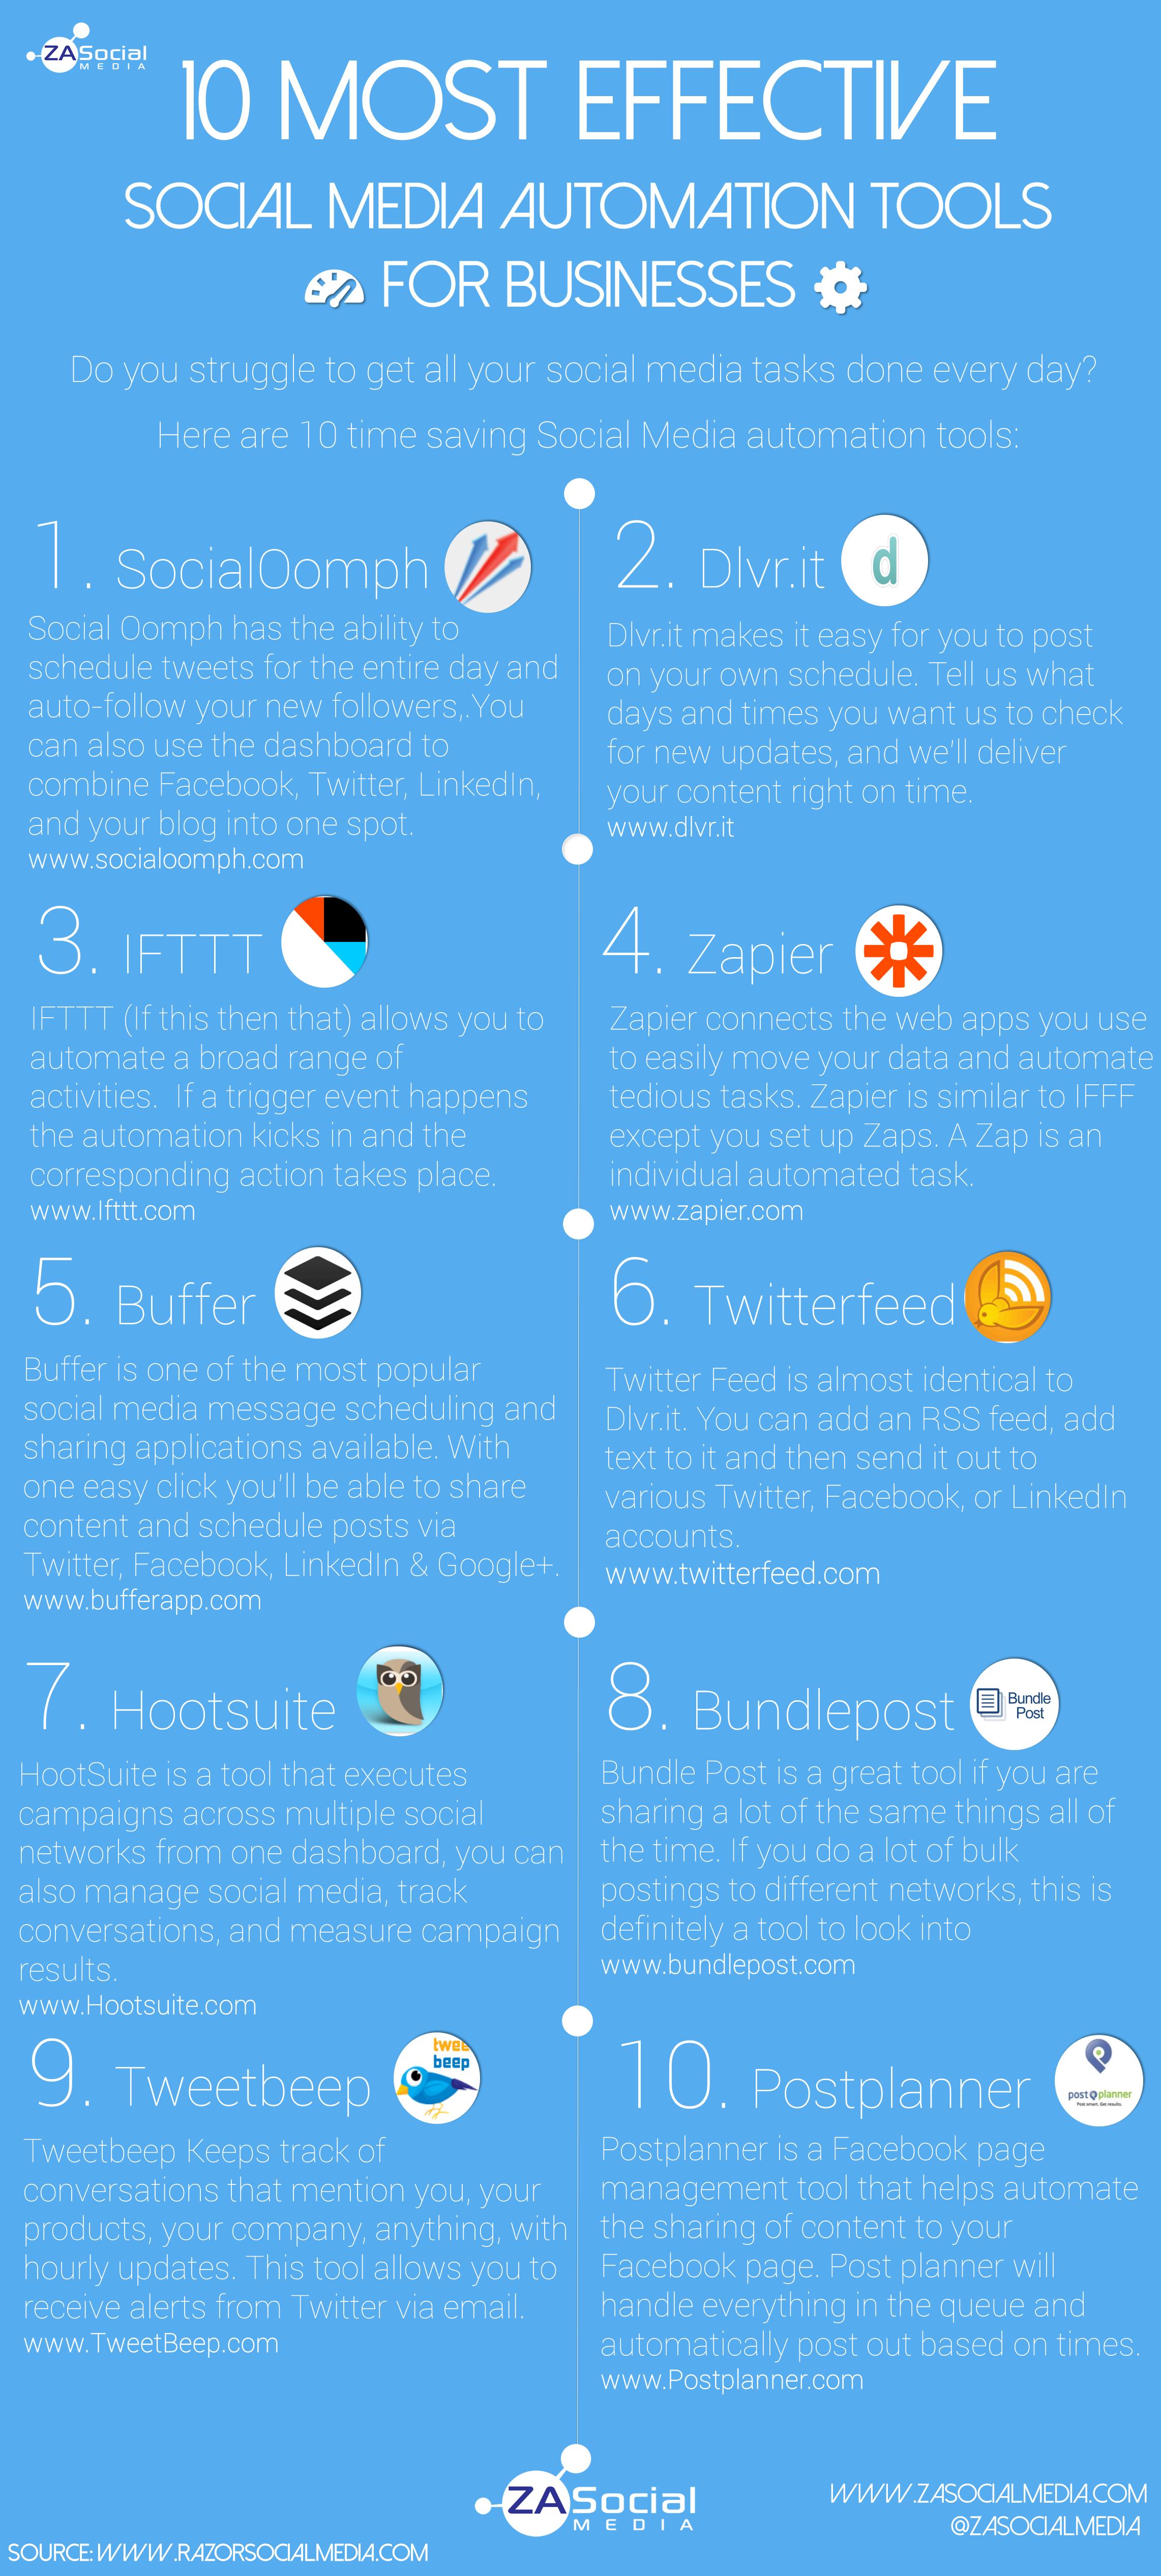 Social-Media-Automation-tools-1